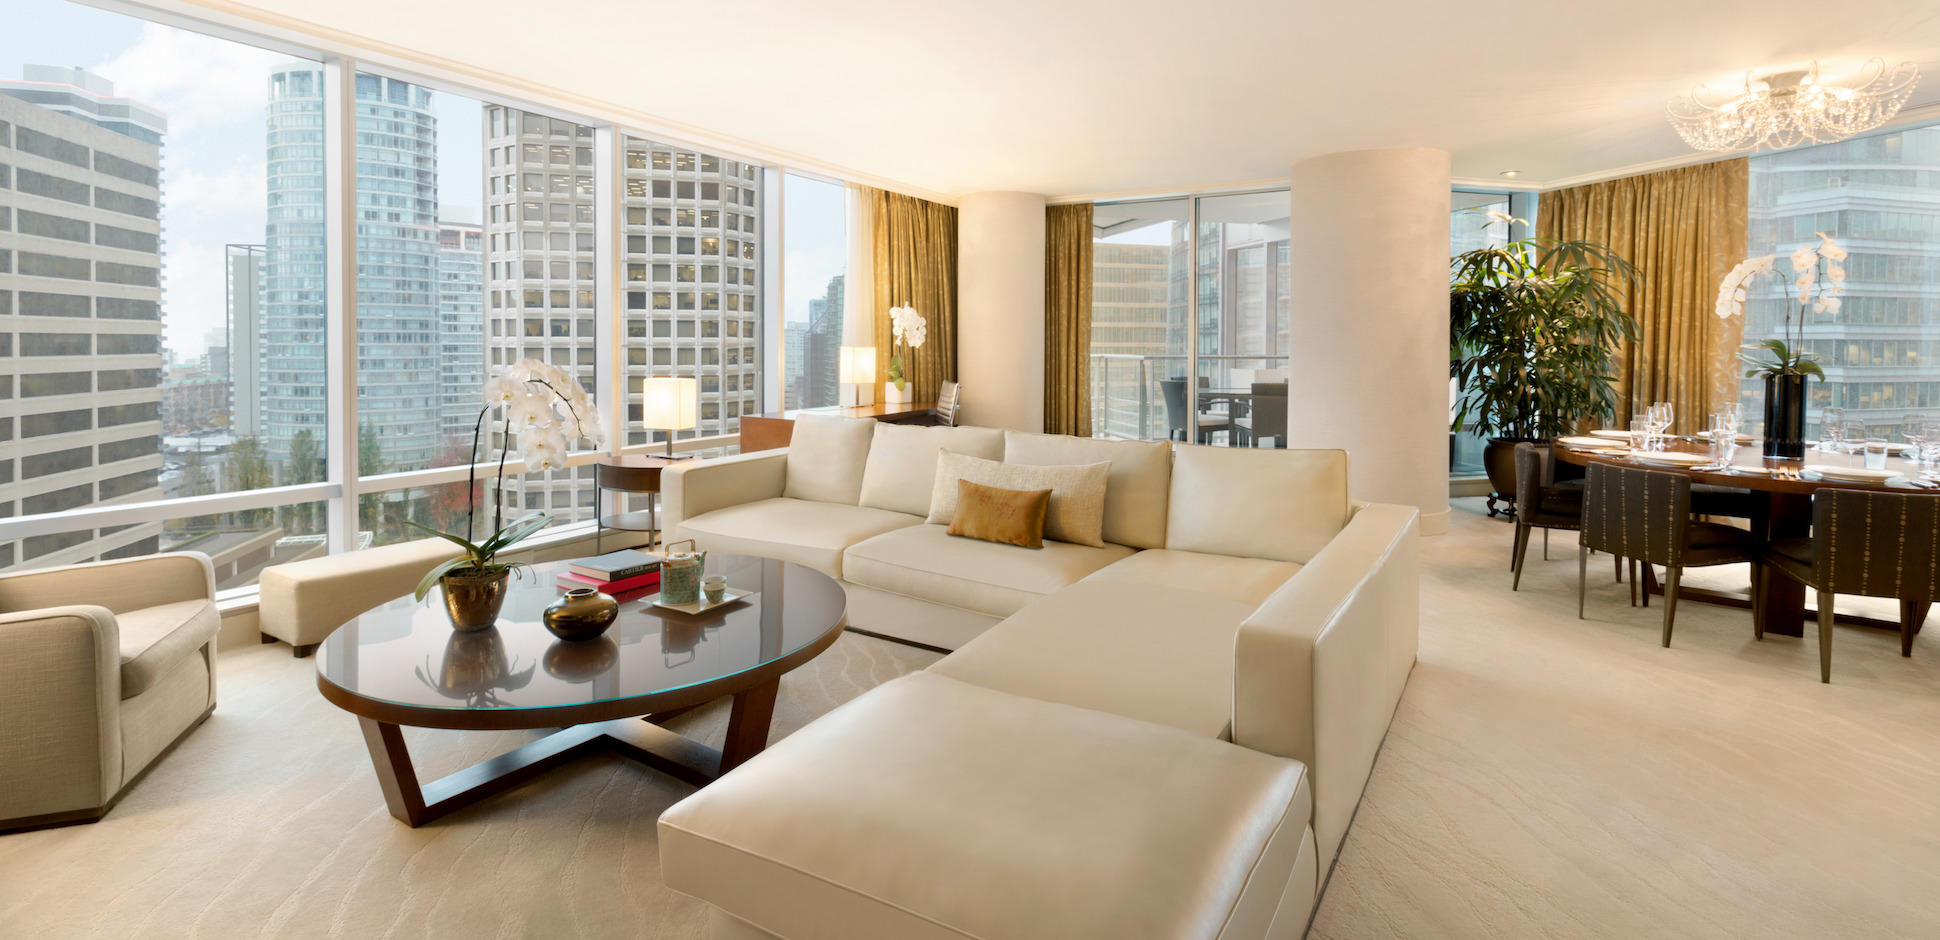 Shangri-La Hotel Vancouver - Orchid Suite - 1238431.jpg